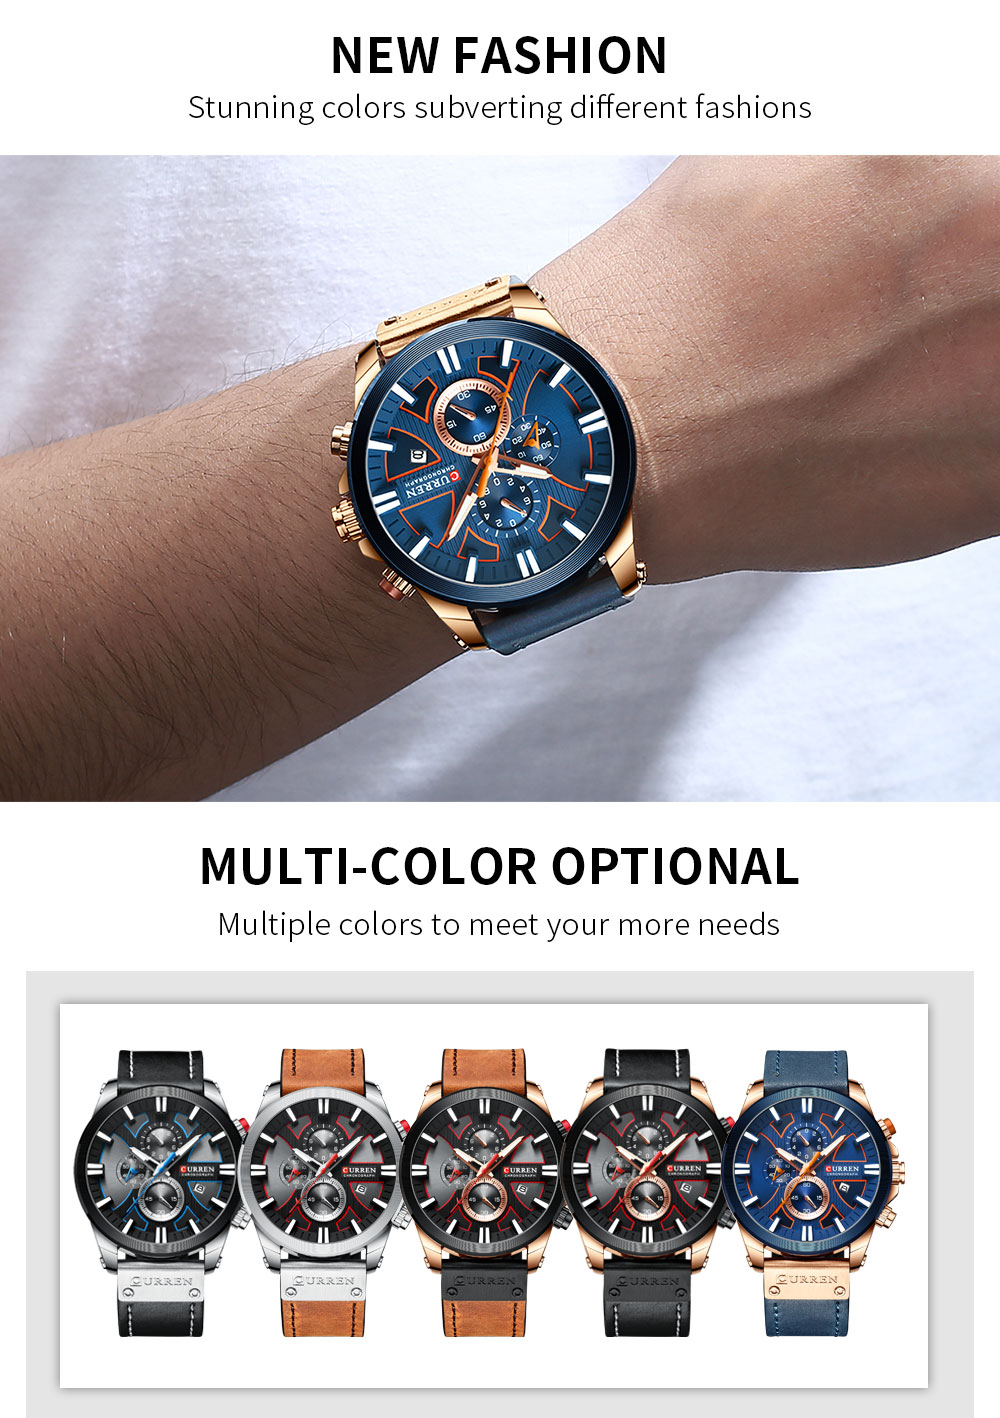 Ha8201c48134943158a9610bcdbf2c85aw New CURREN Men Watches Fashion Quartz Wrist Watches Men's Military Waterproof Sports Watch Male Date Clock Relogio Masculino